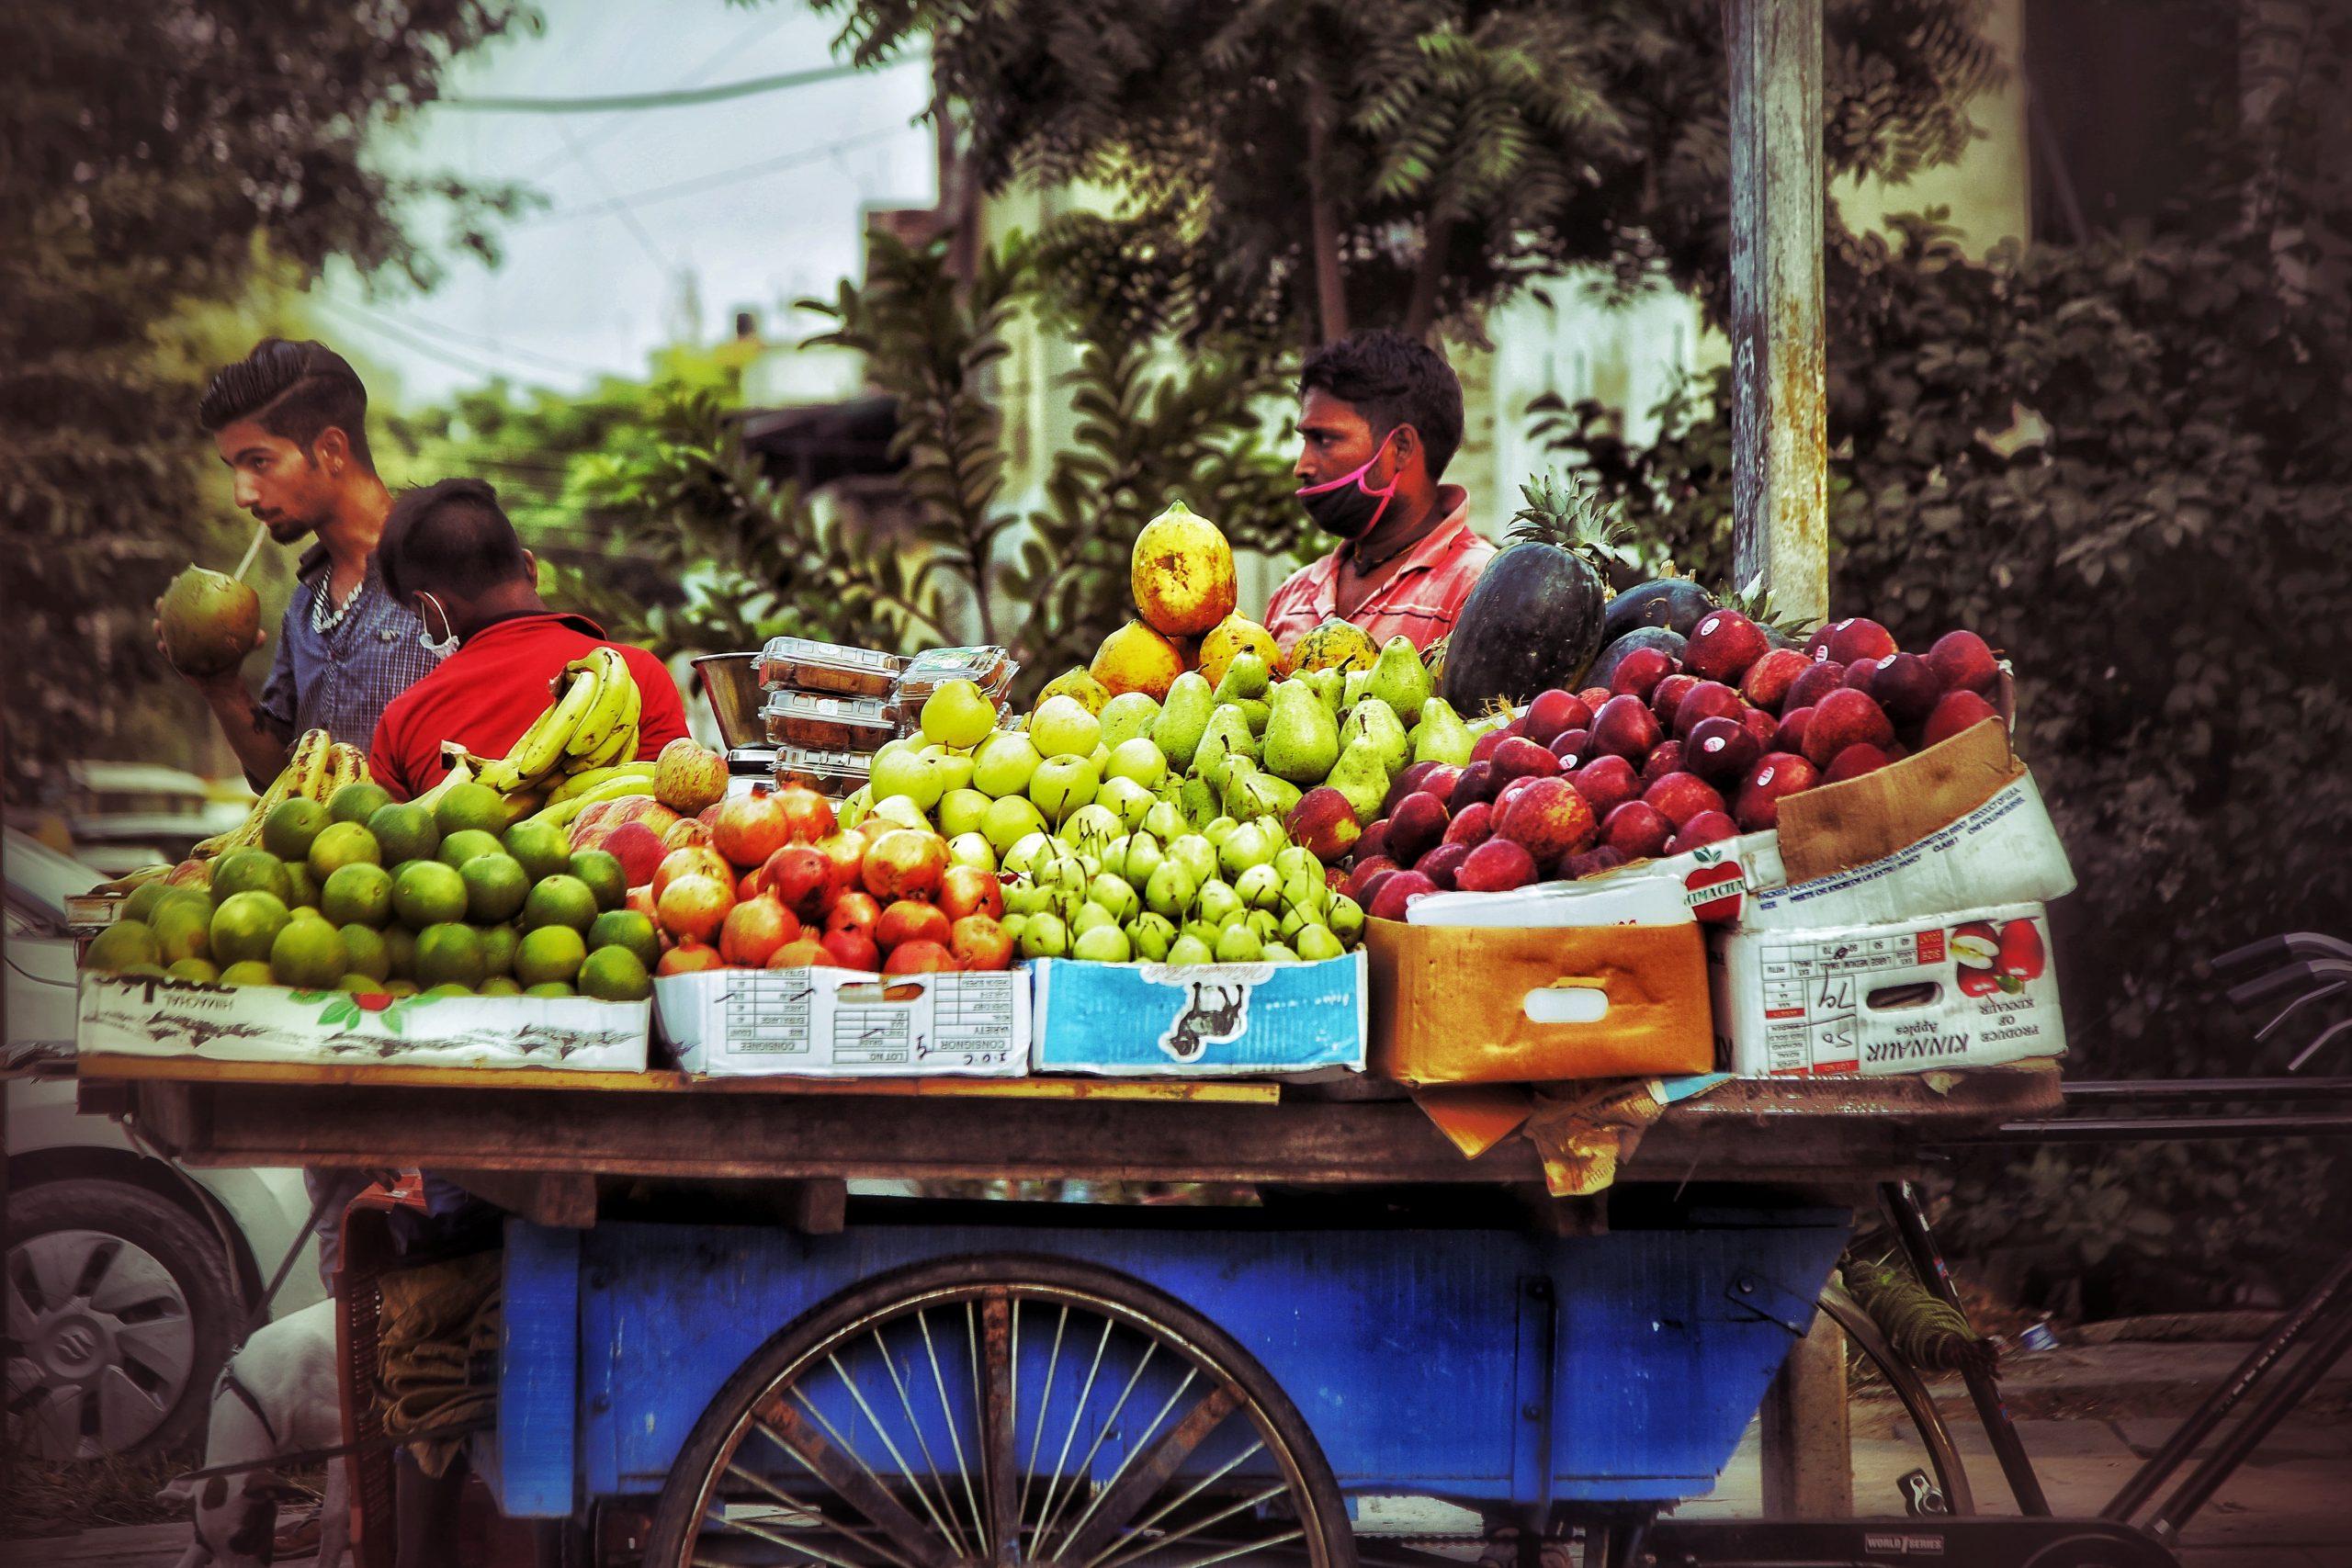 Street fruits seller